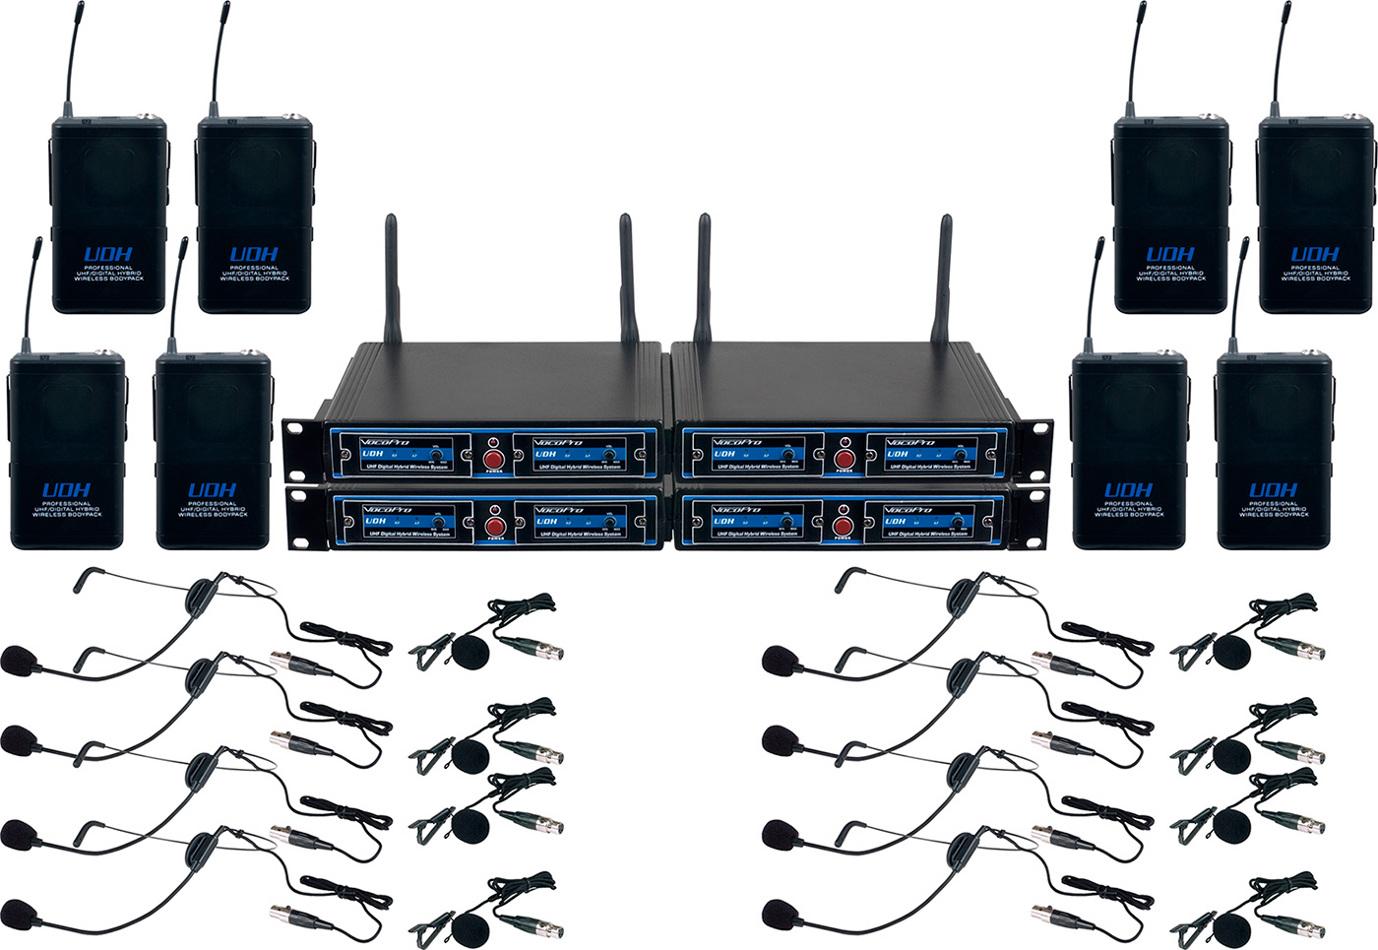 VocoPro UDH-PLAY 8 8-Ch, 900 Mhz, UHF/DSP Hybrid Bodypack Wireless Mic System UDH-PLAY-8